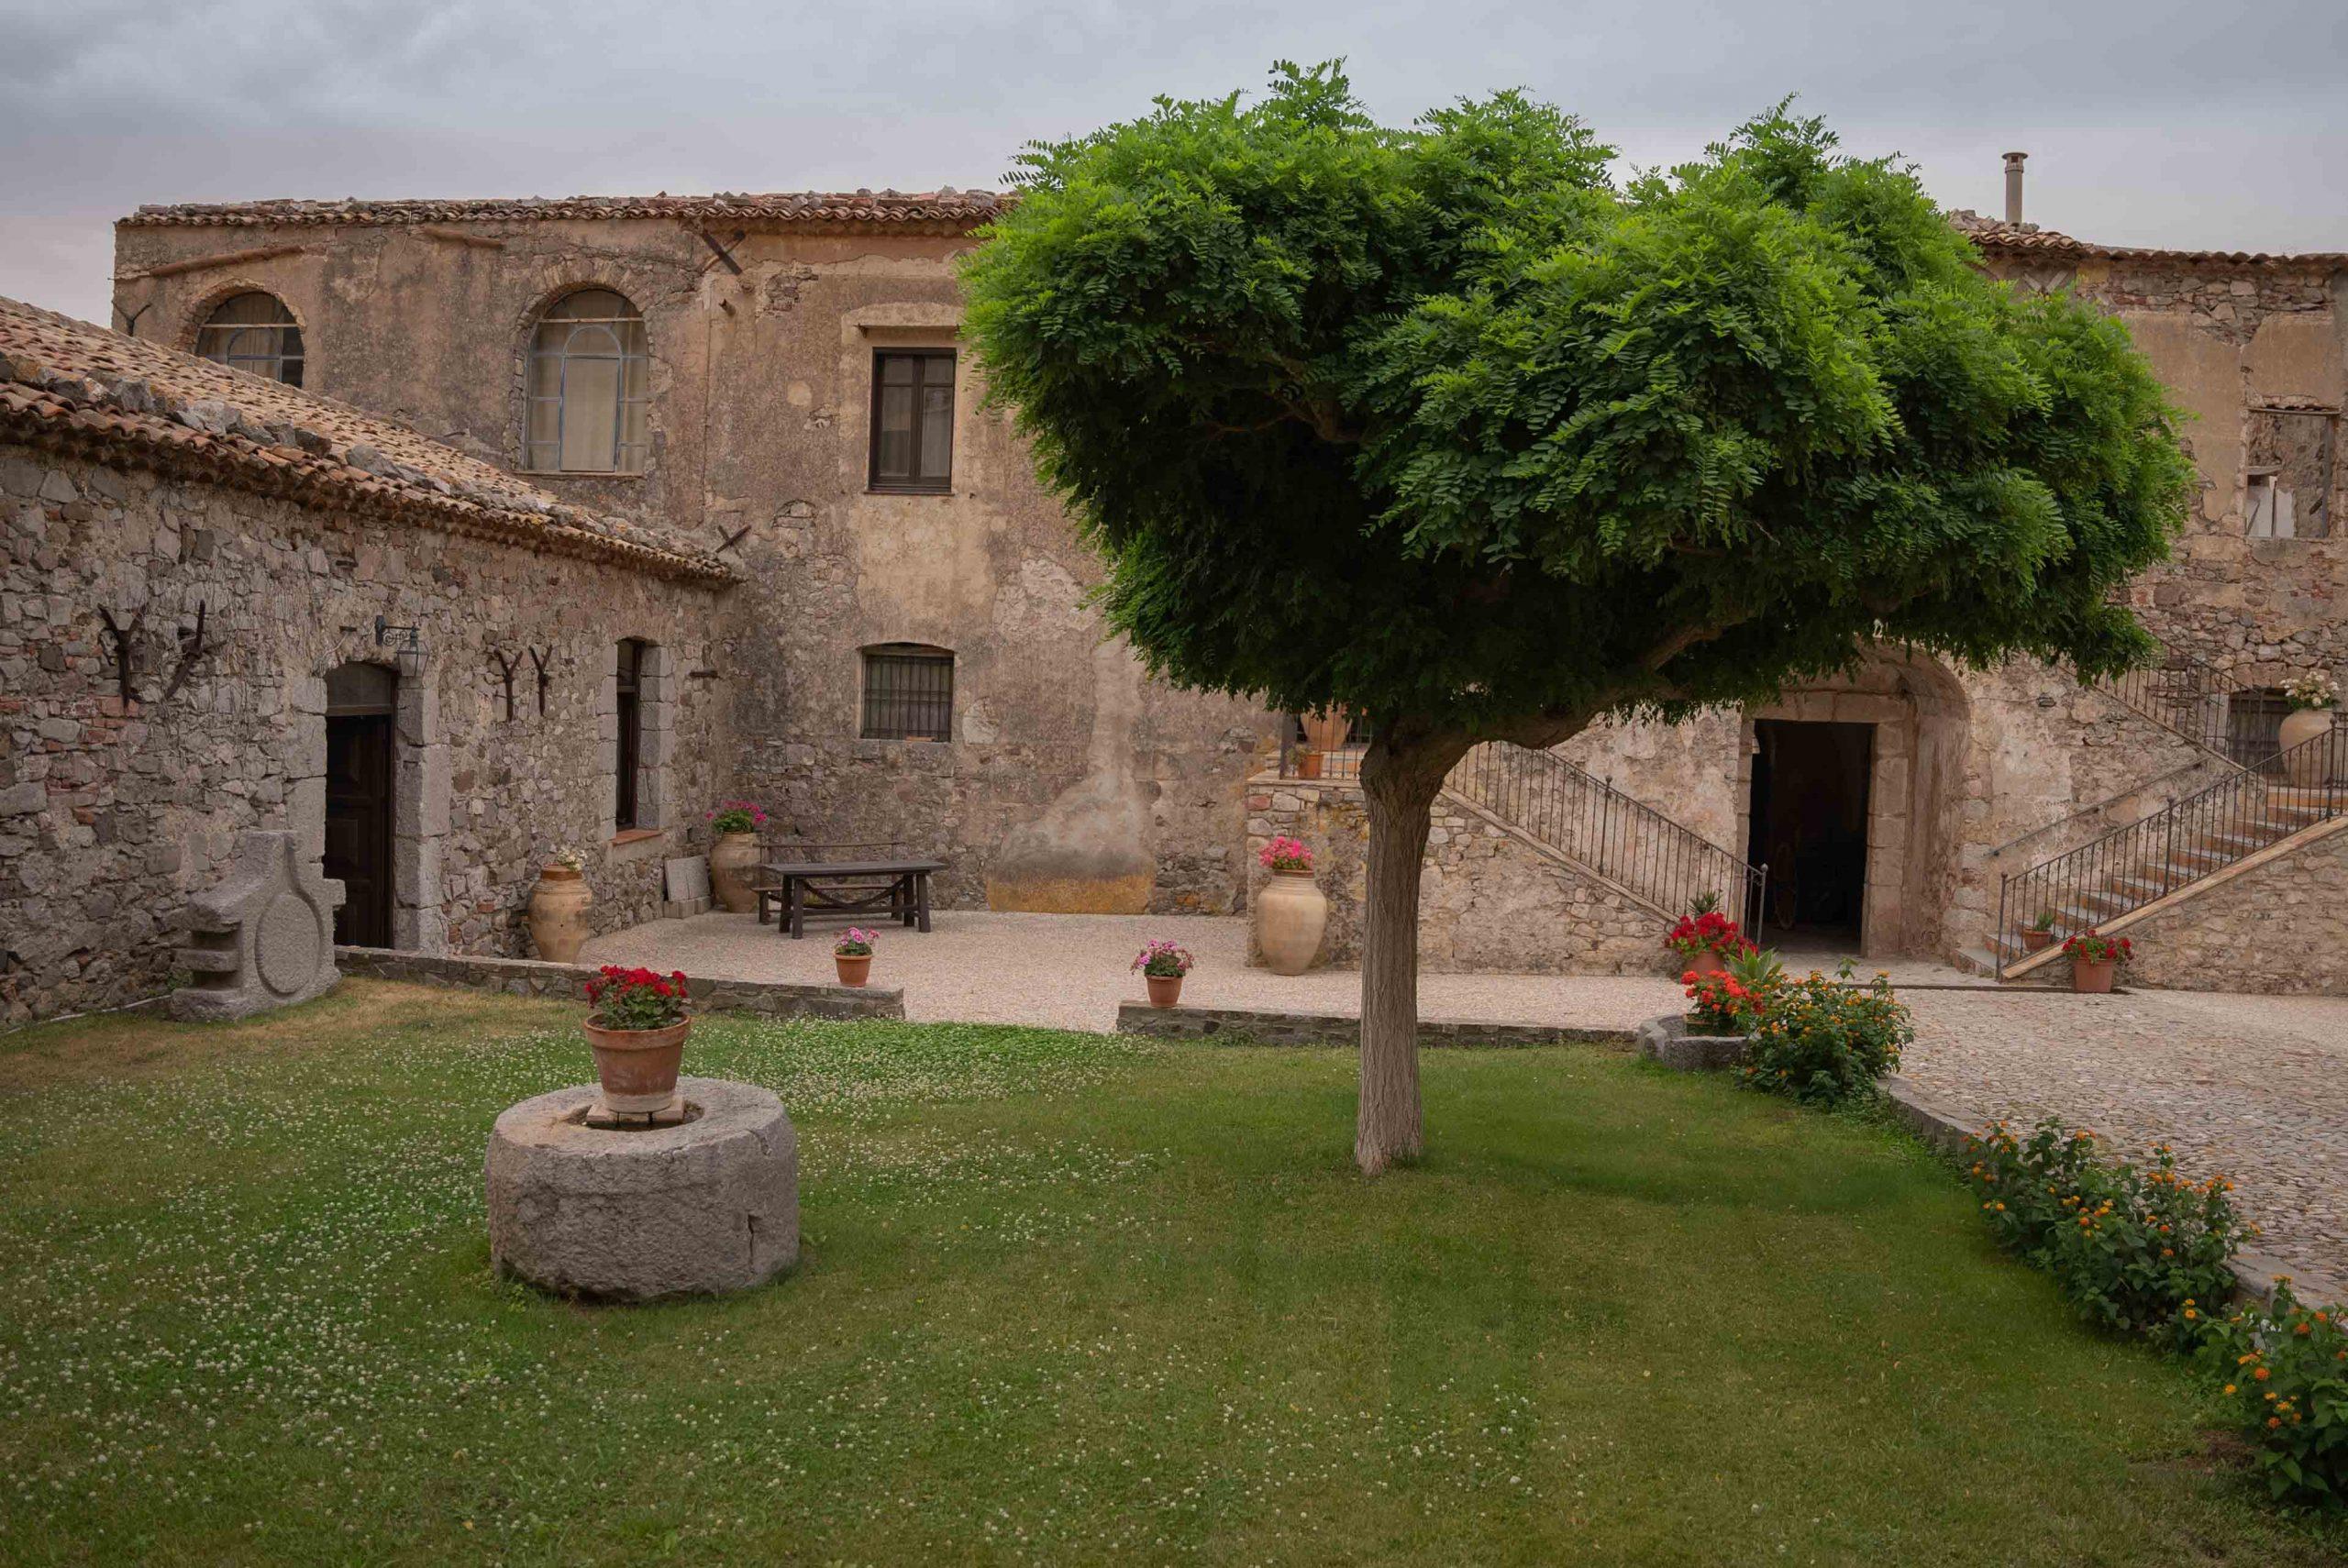 Land_Rover_Tour_Sicilia_2021_Land_Rover_Experience_Italia_-51